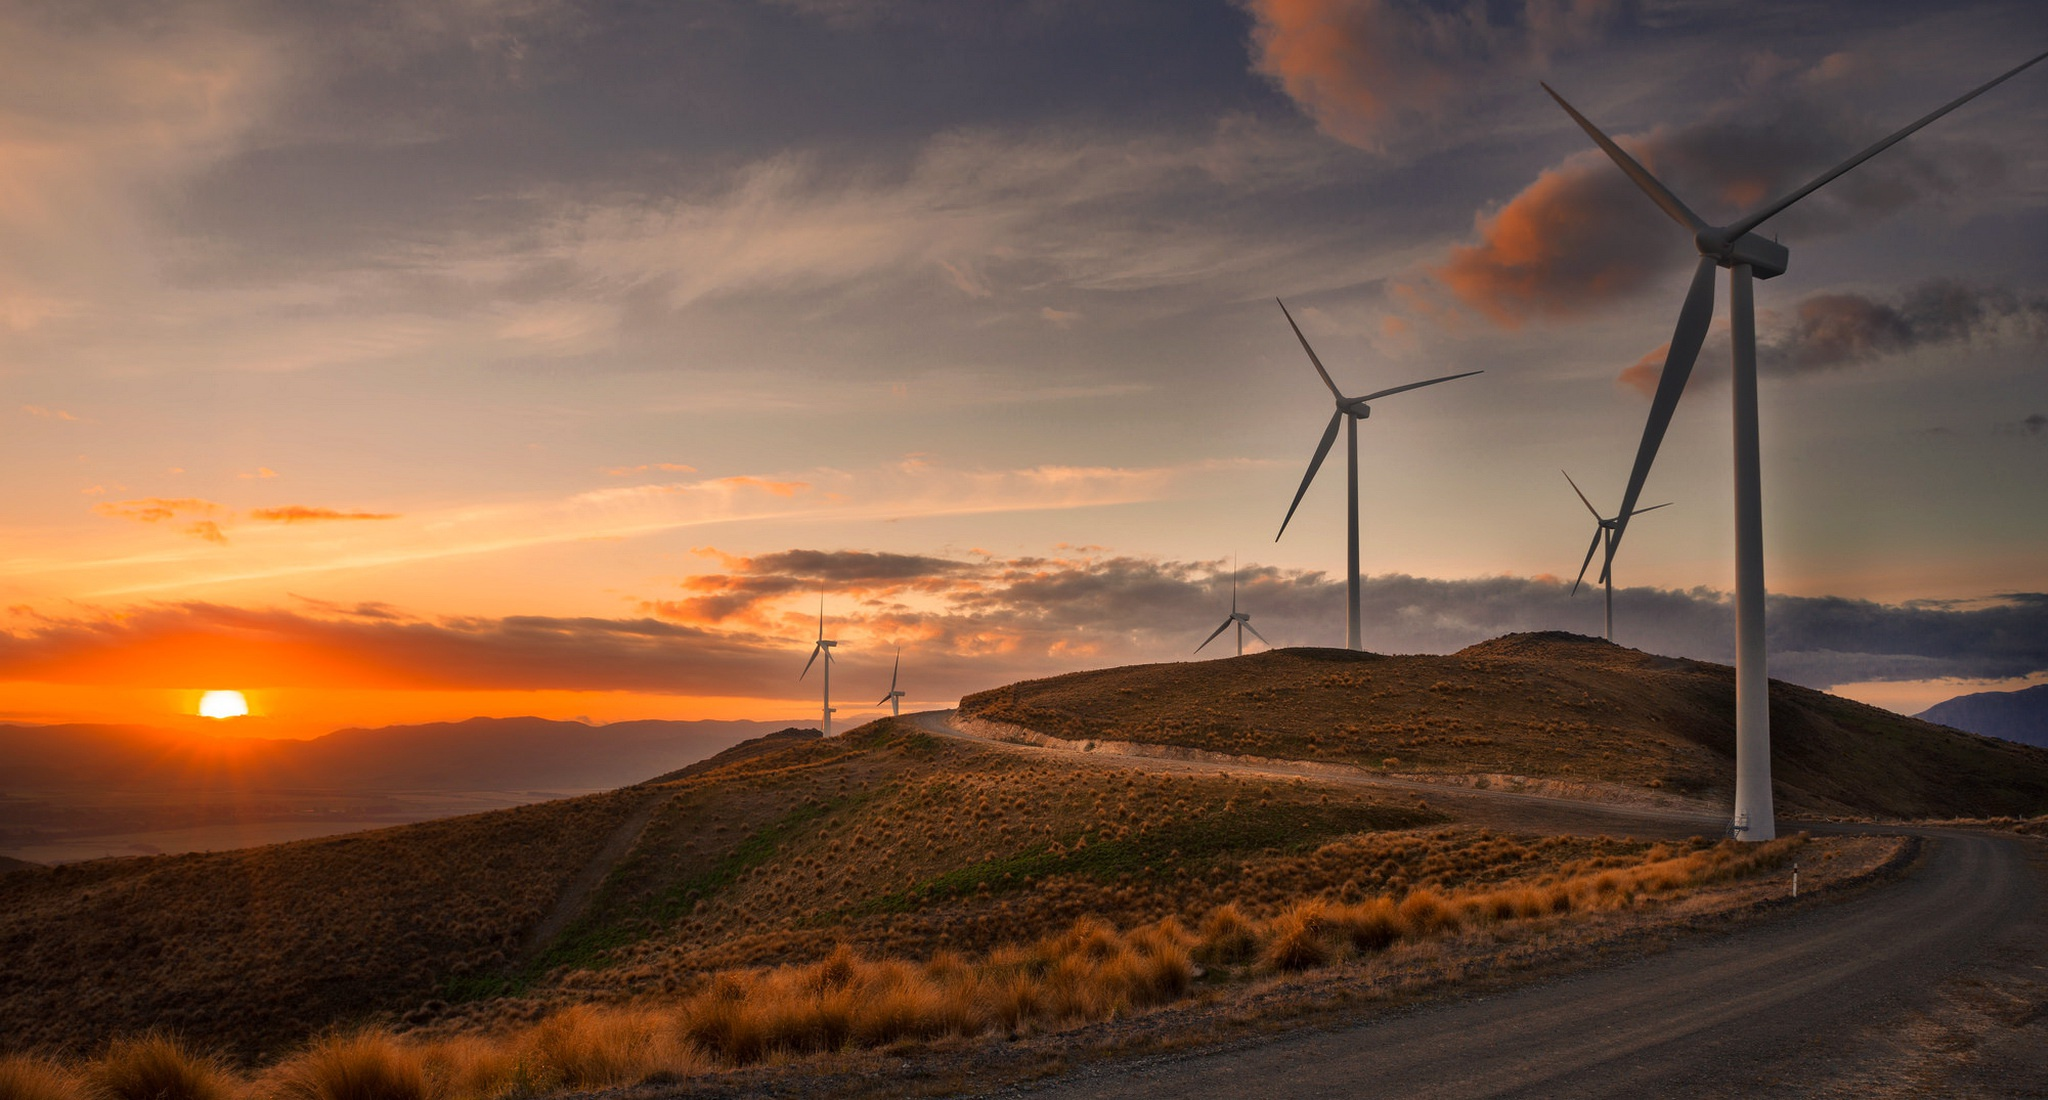 wind turbine hd wallpaper background image 2048x1100